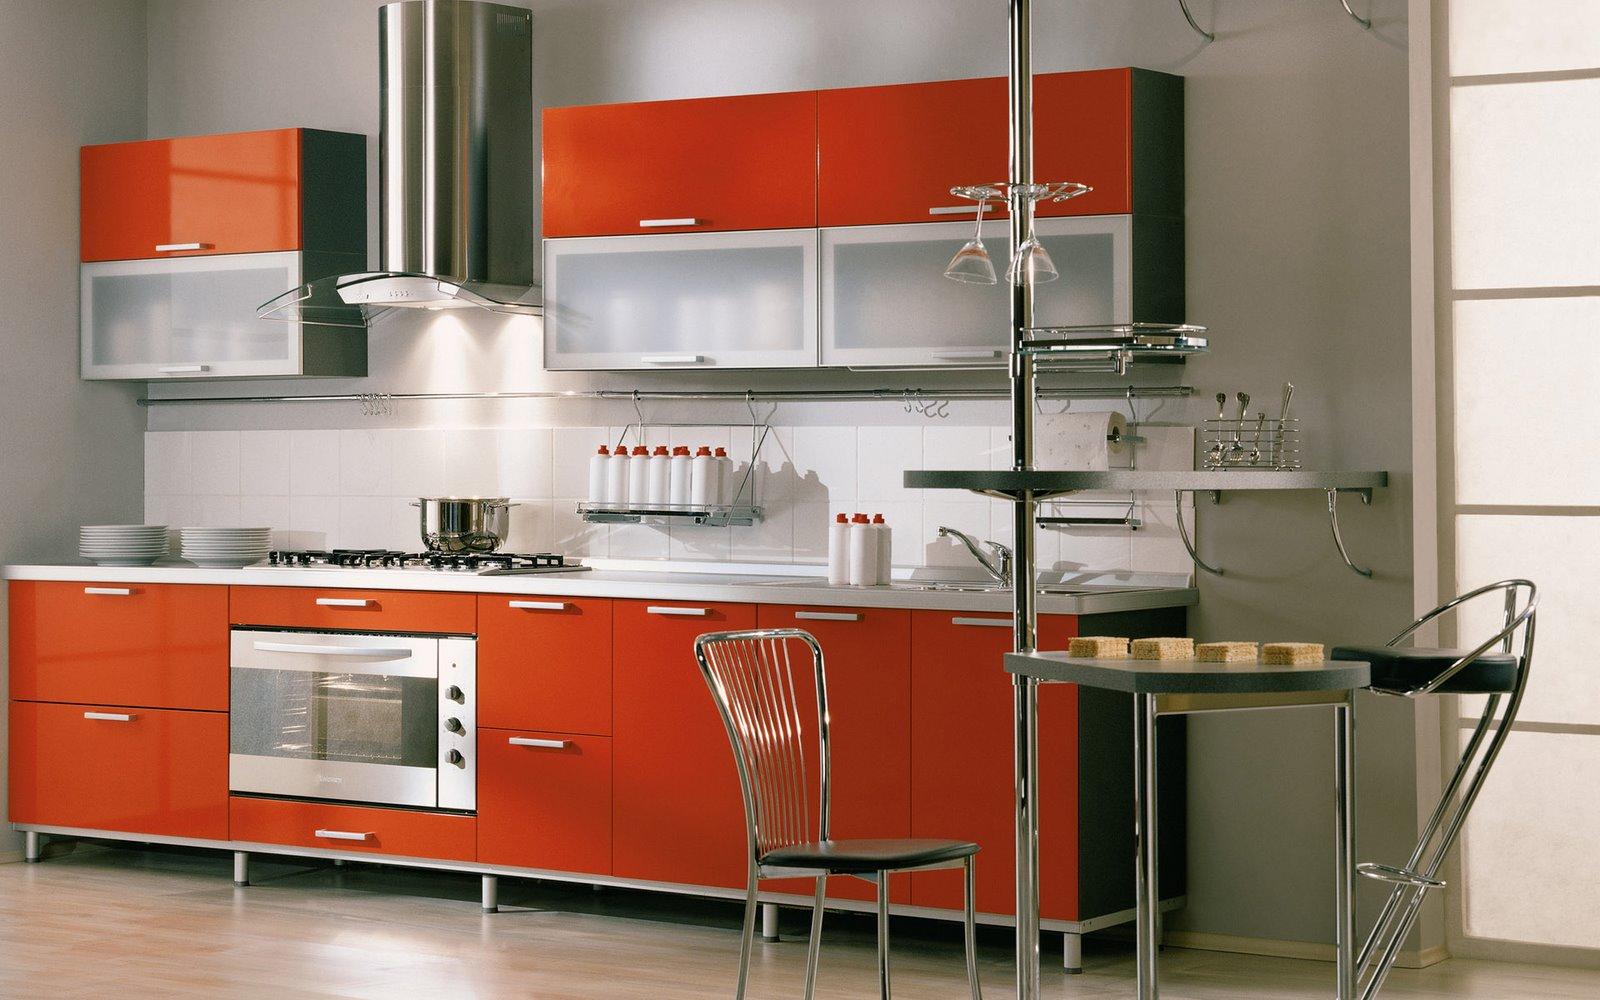 awesome kitchen design apartments lit kitchen home designs latest modern home kitchen cabinet designs ideas